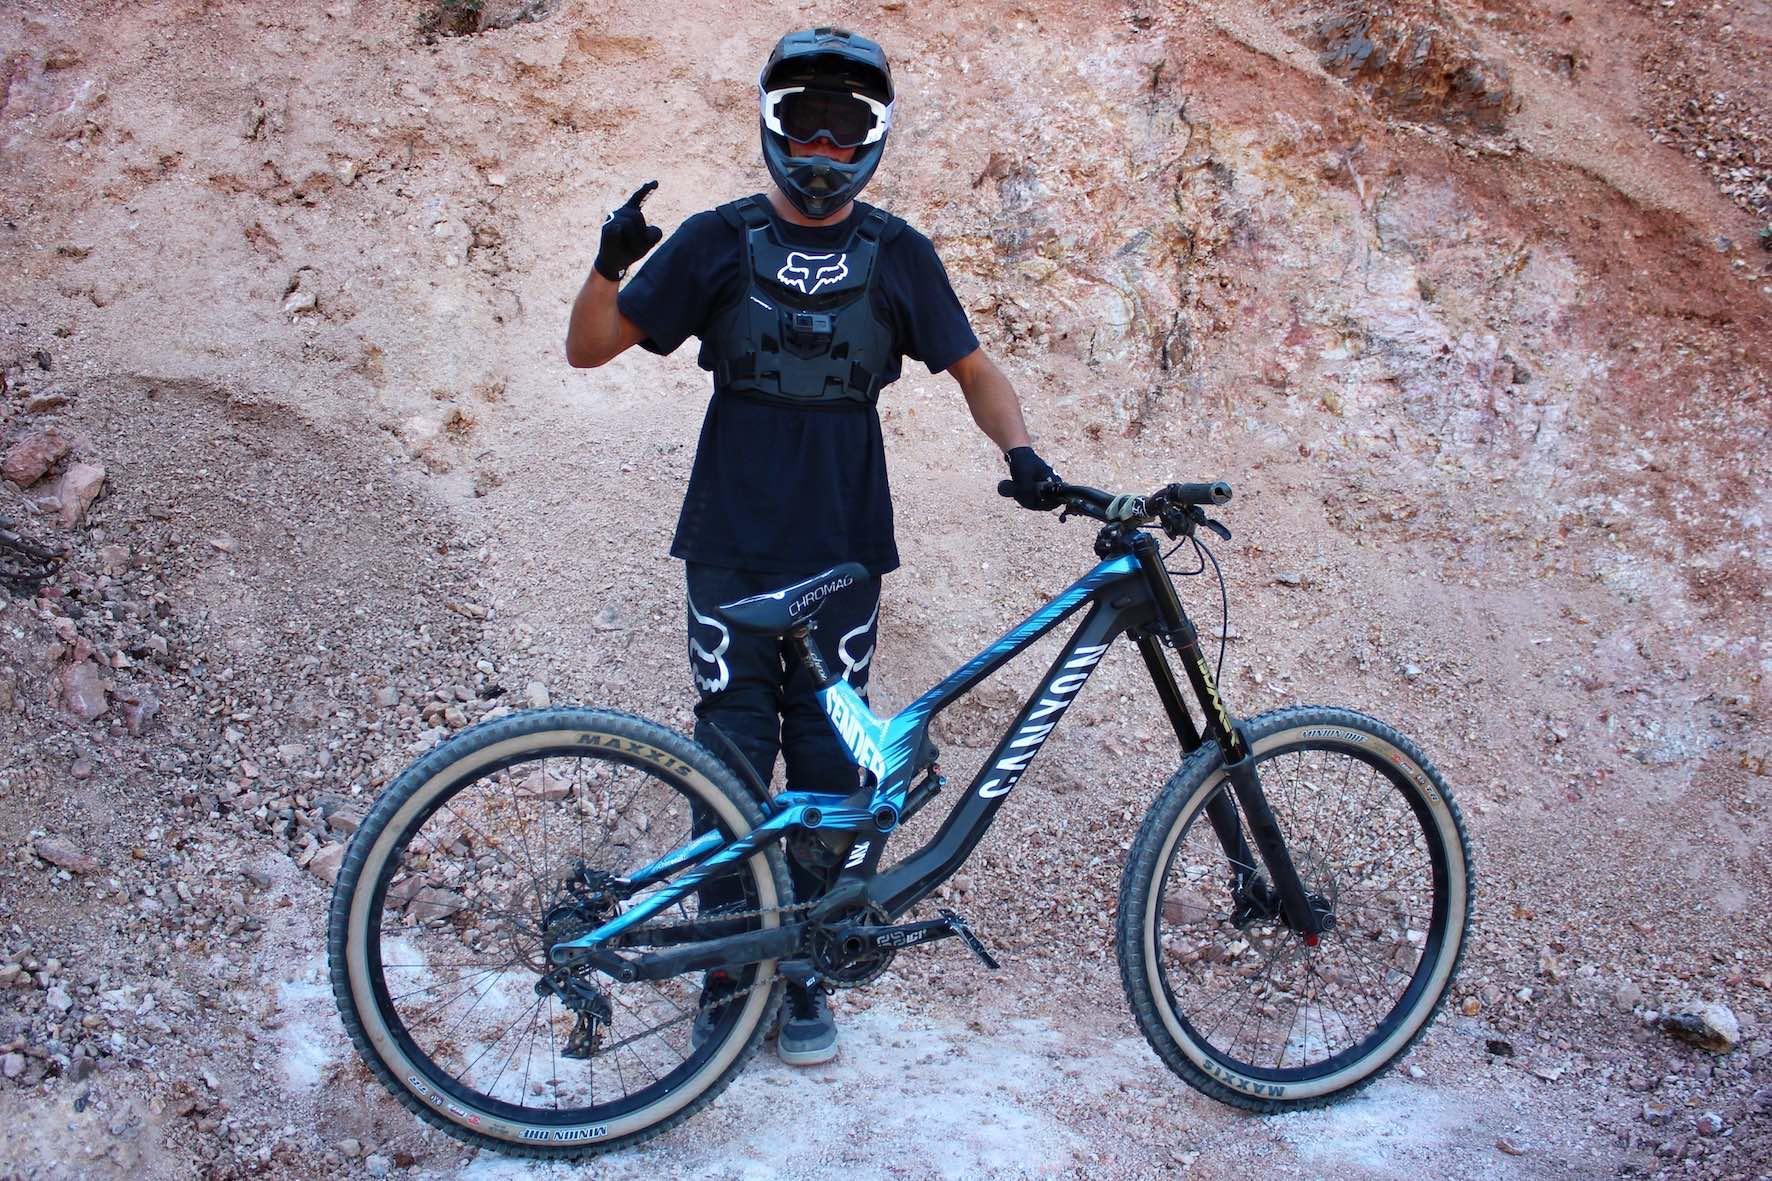 Nico Scholze Canyon Sender Audi Nines bike